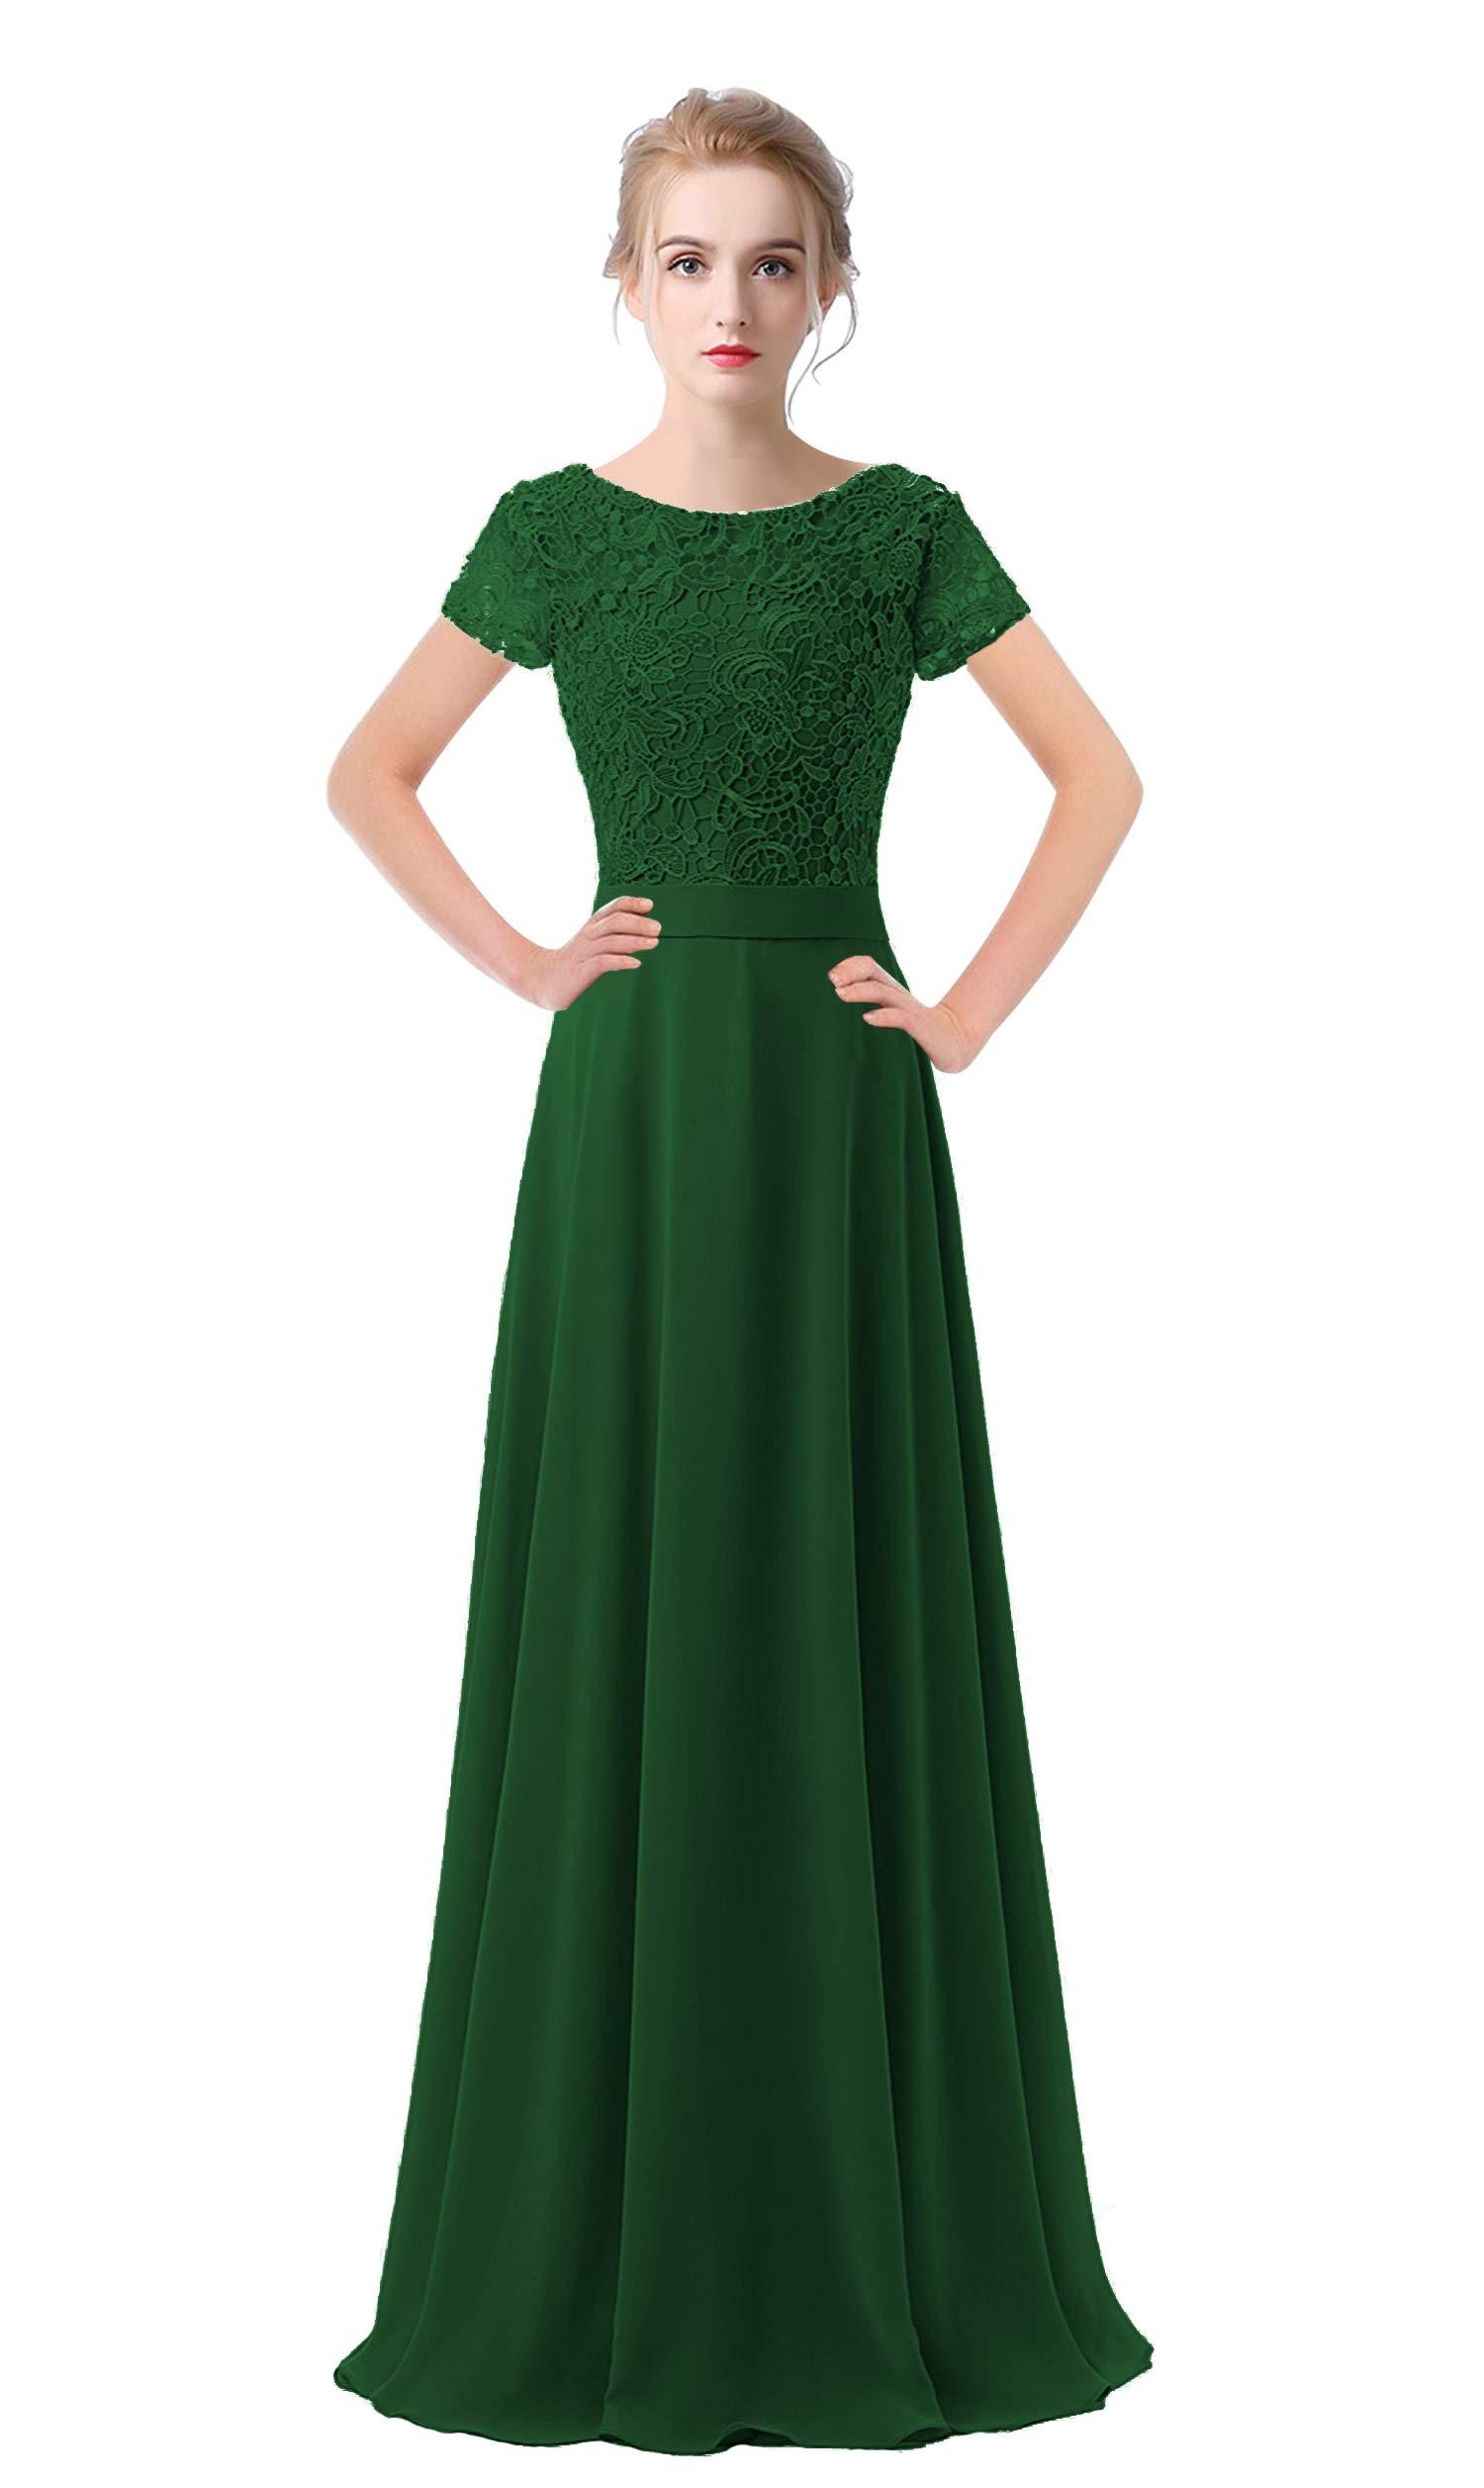 25a029dc25c1 VaniaDress Women Lace Short Sleeves Long Evening Dress Prom Gown V061LF  Dark Green US8